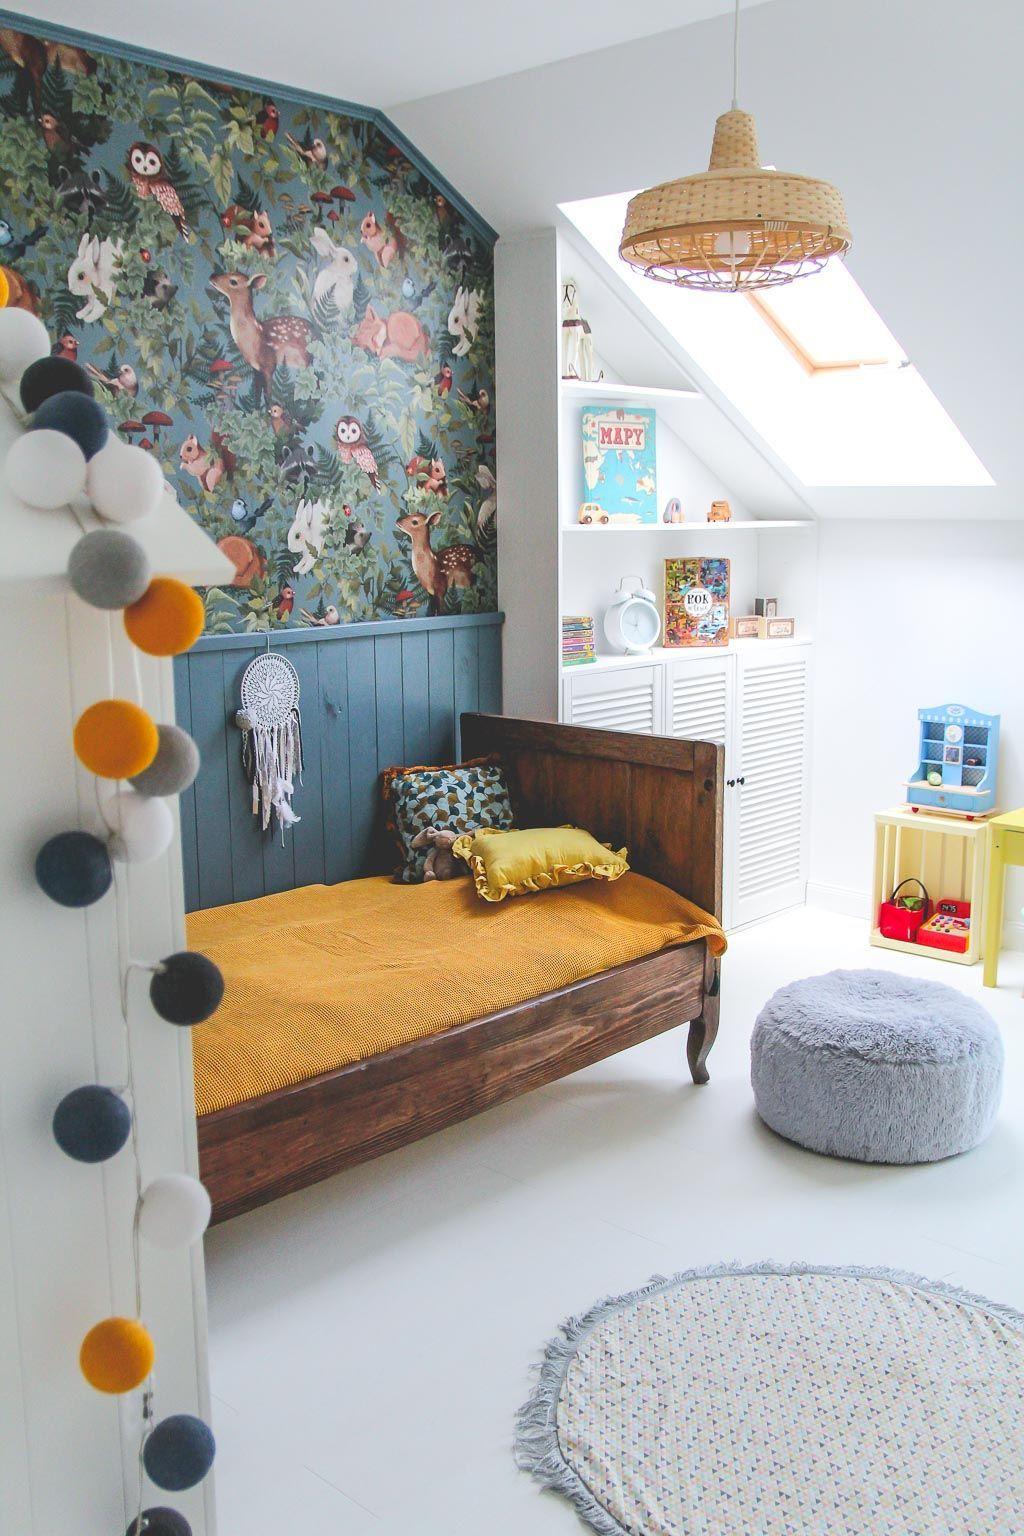 Designing the Ultimate Kids Bedroom Decor: Wallpapers | Kids Rooms ...